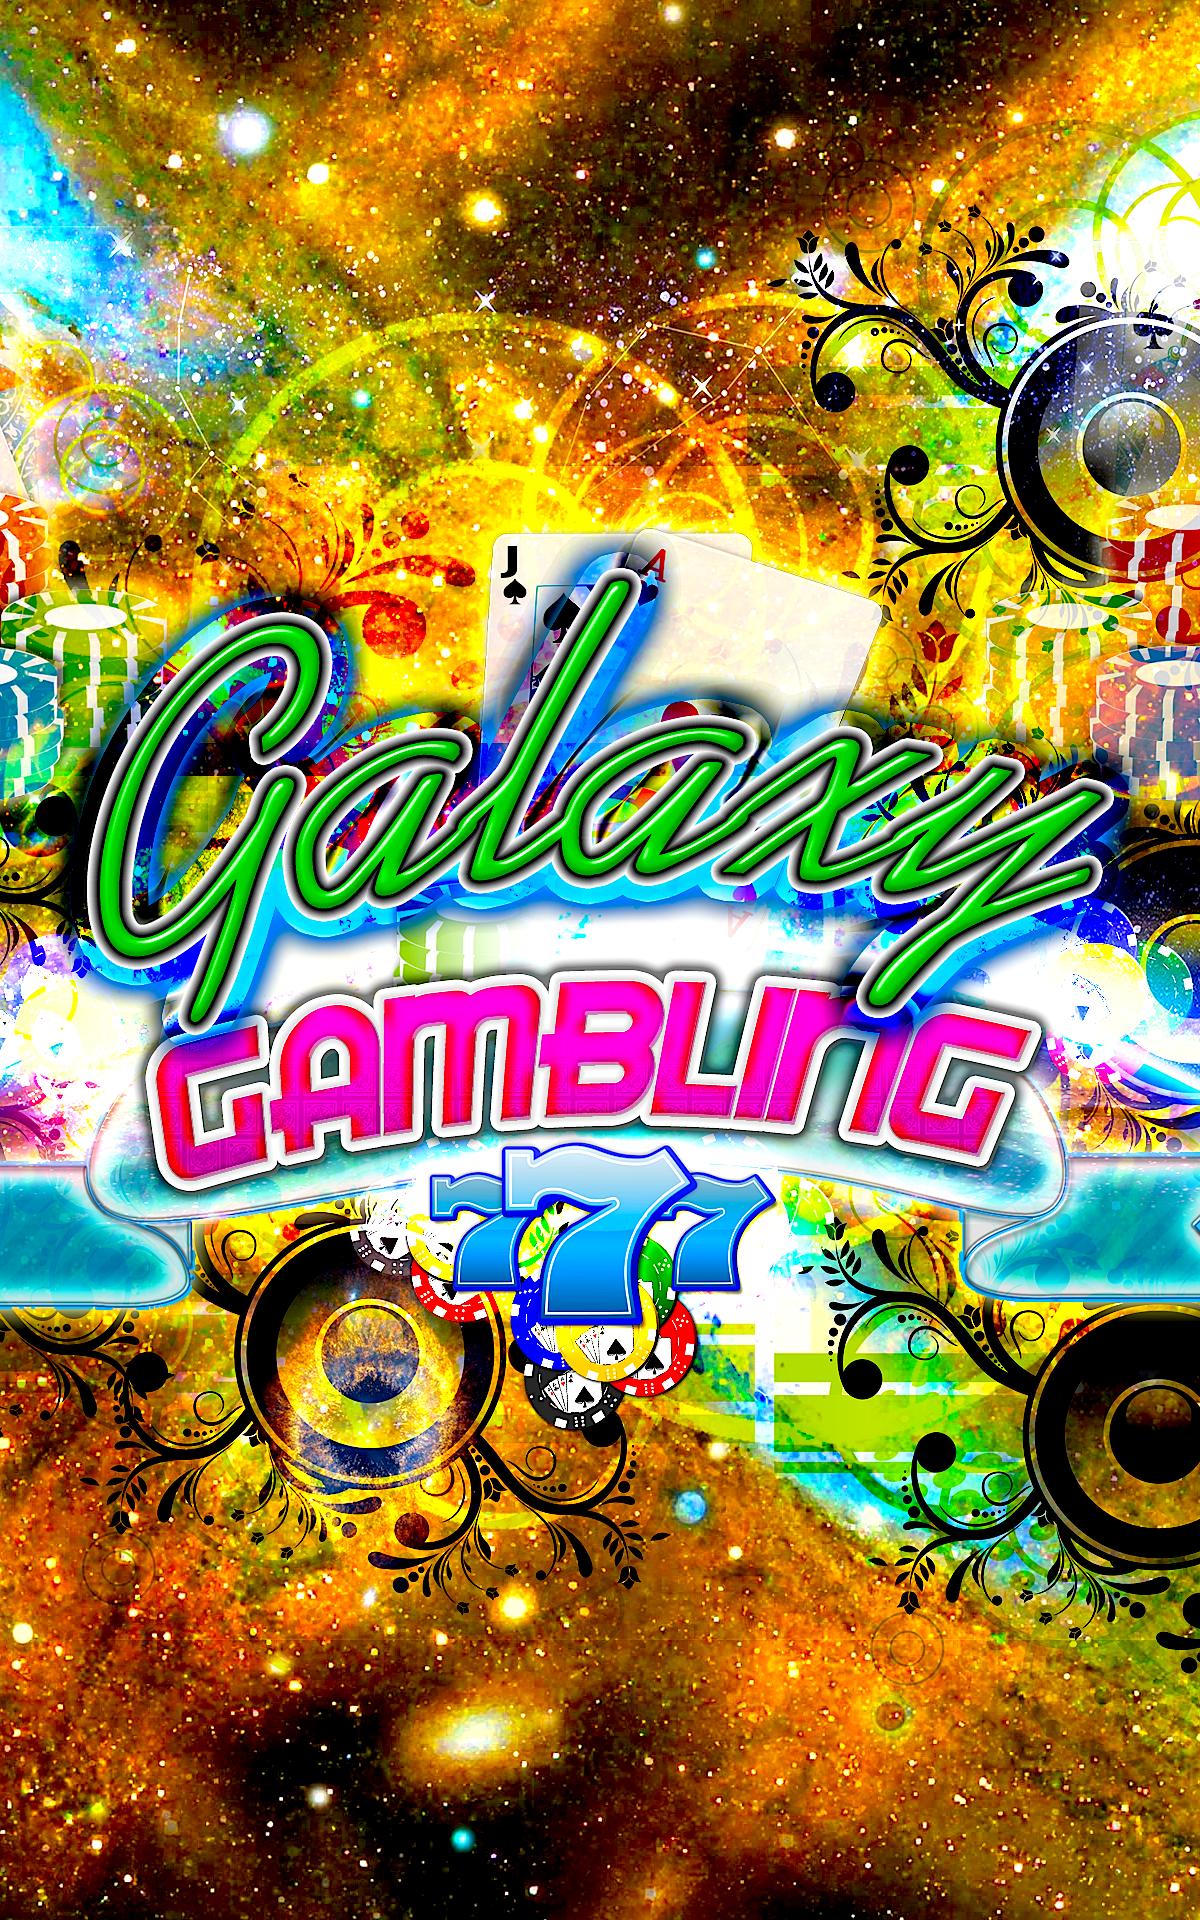 Springbok casino coupons 2020